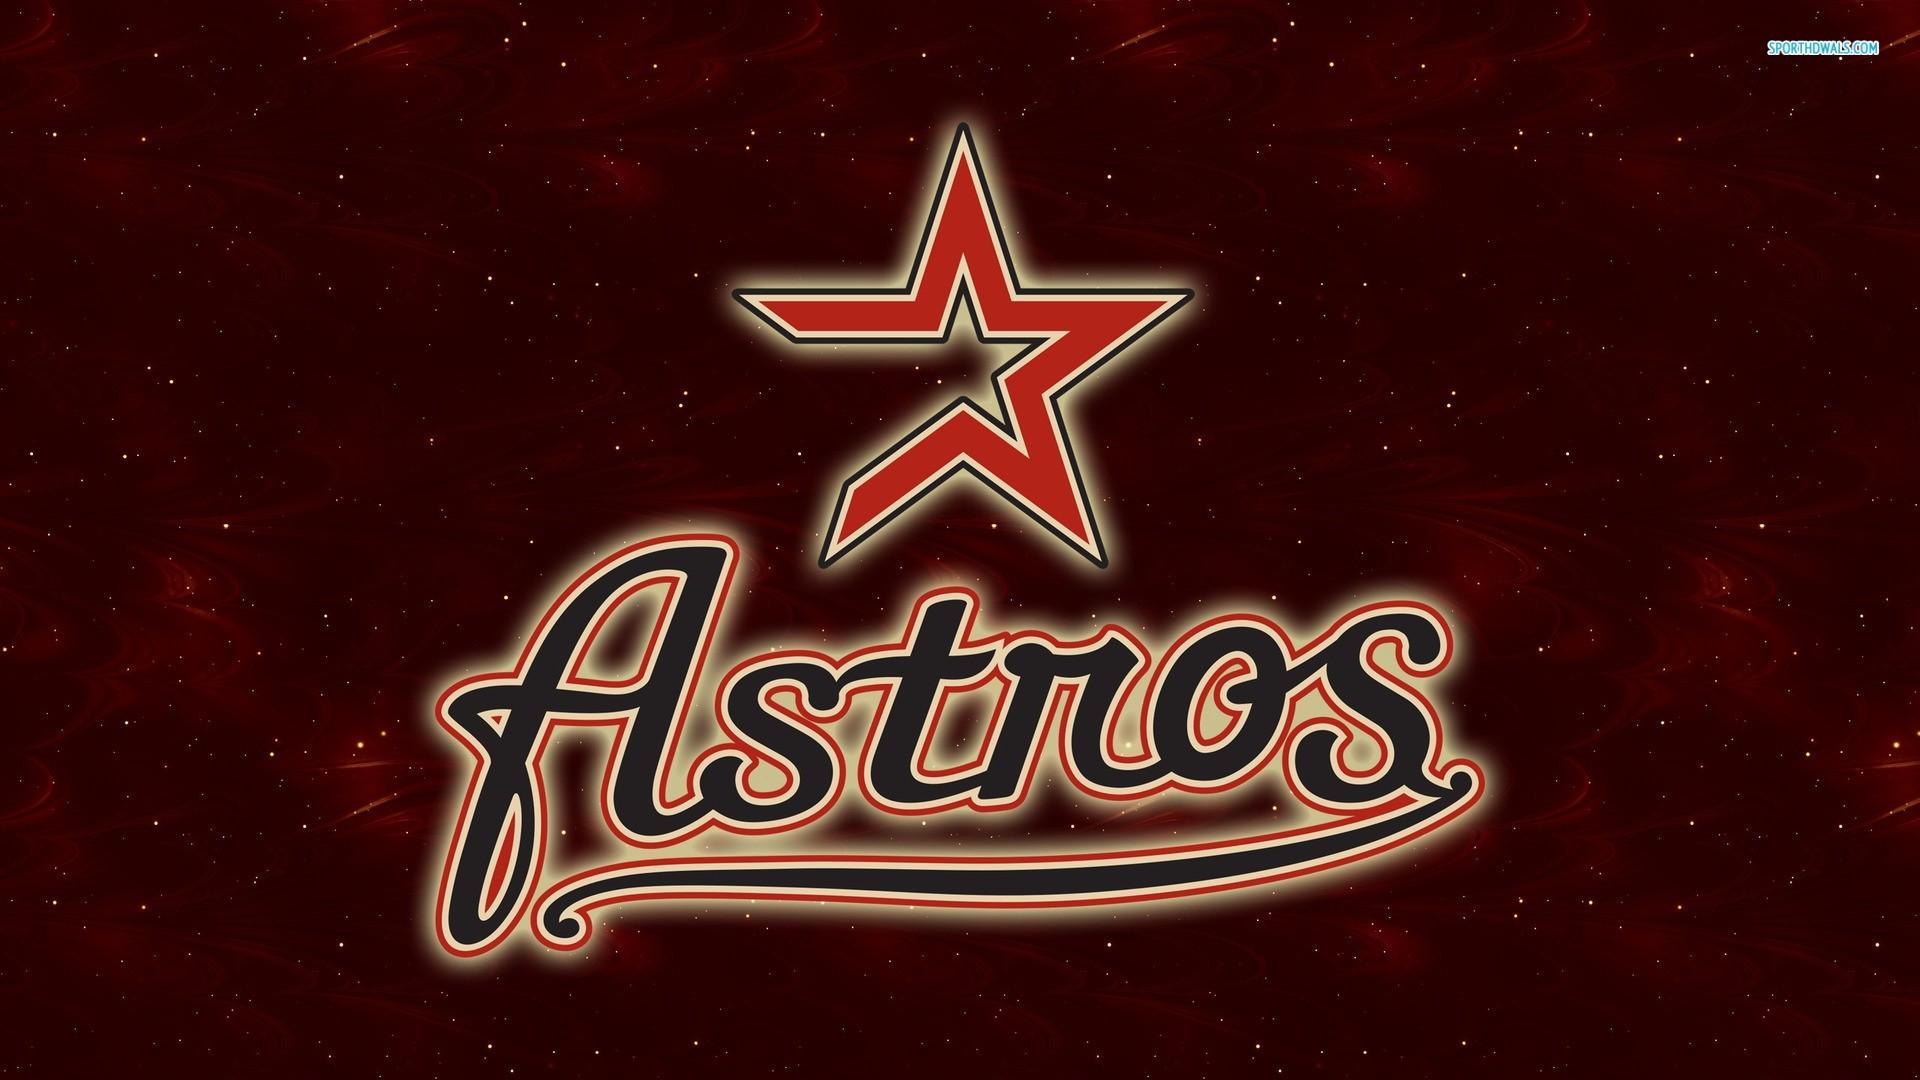 Houston Astros Desktop wallpaper